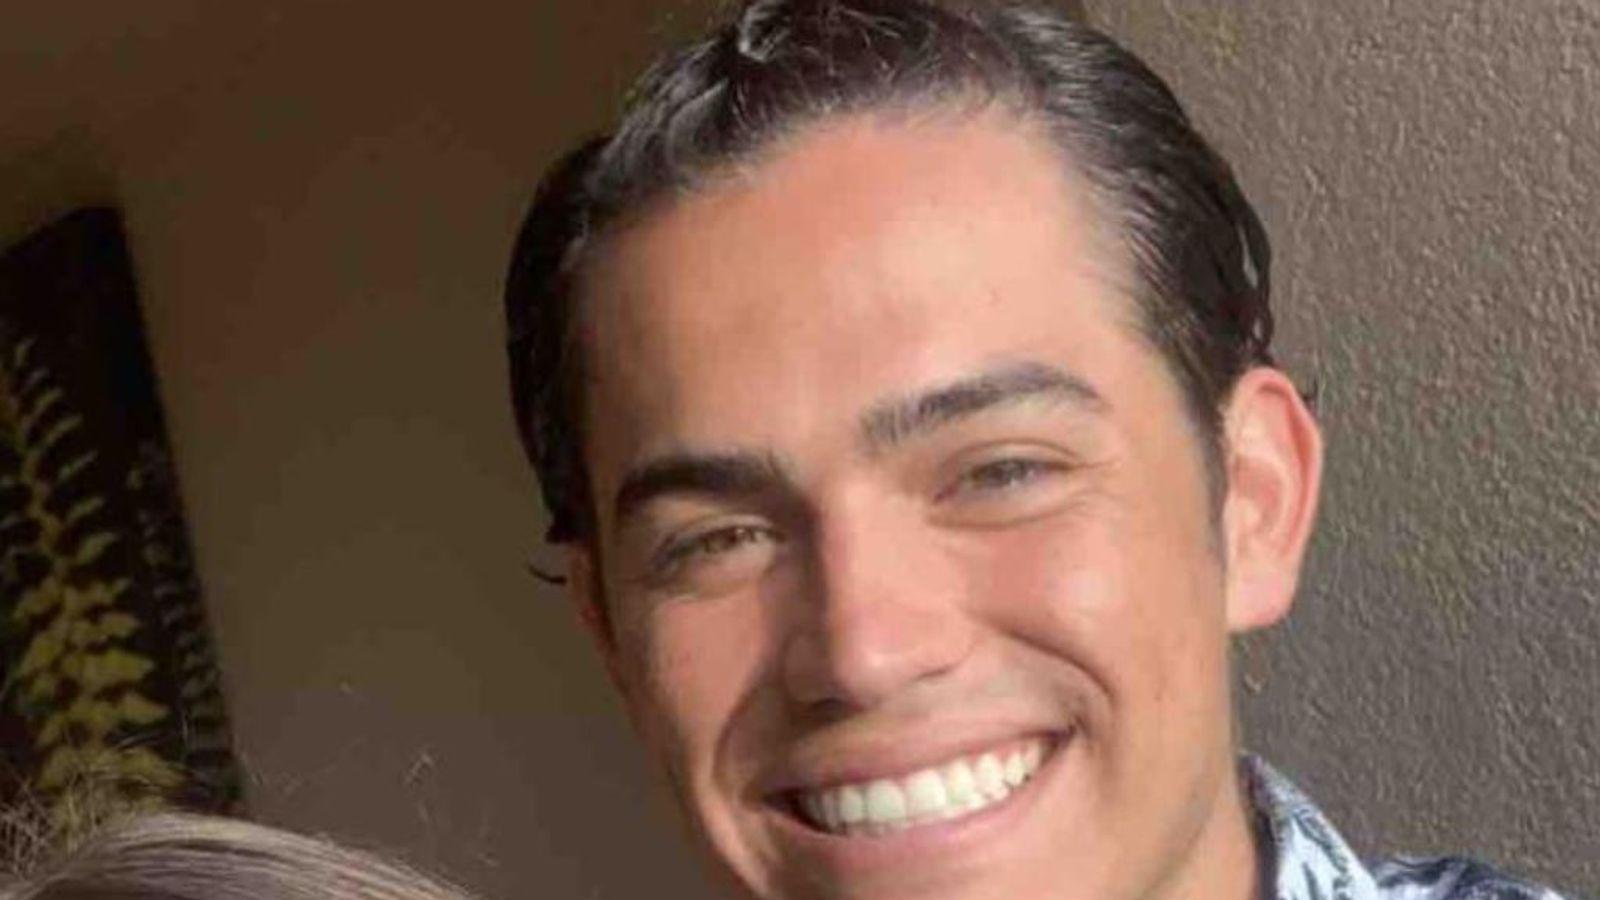 Anthony Barajas: TikTok star dies days after California cinema shooting